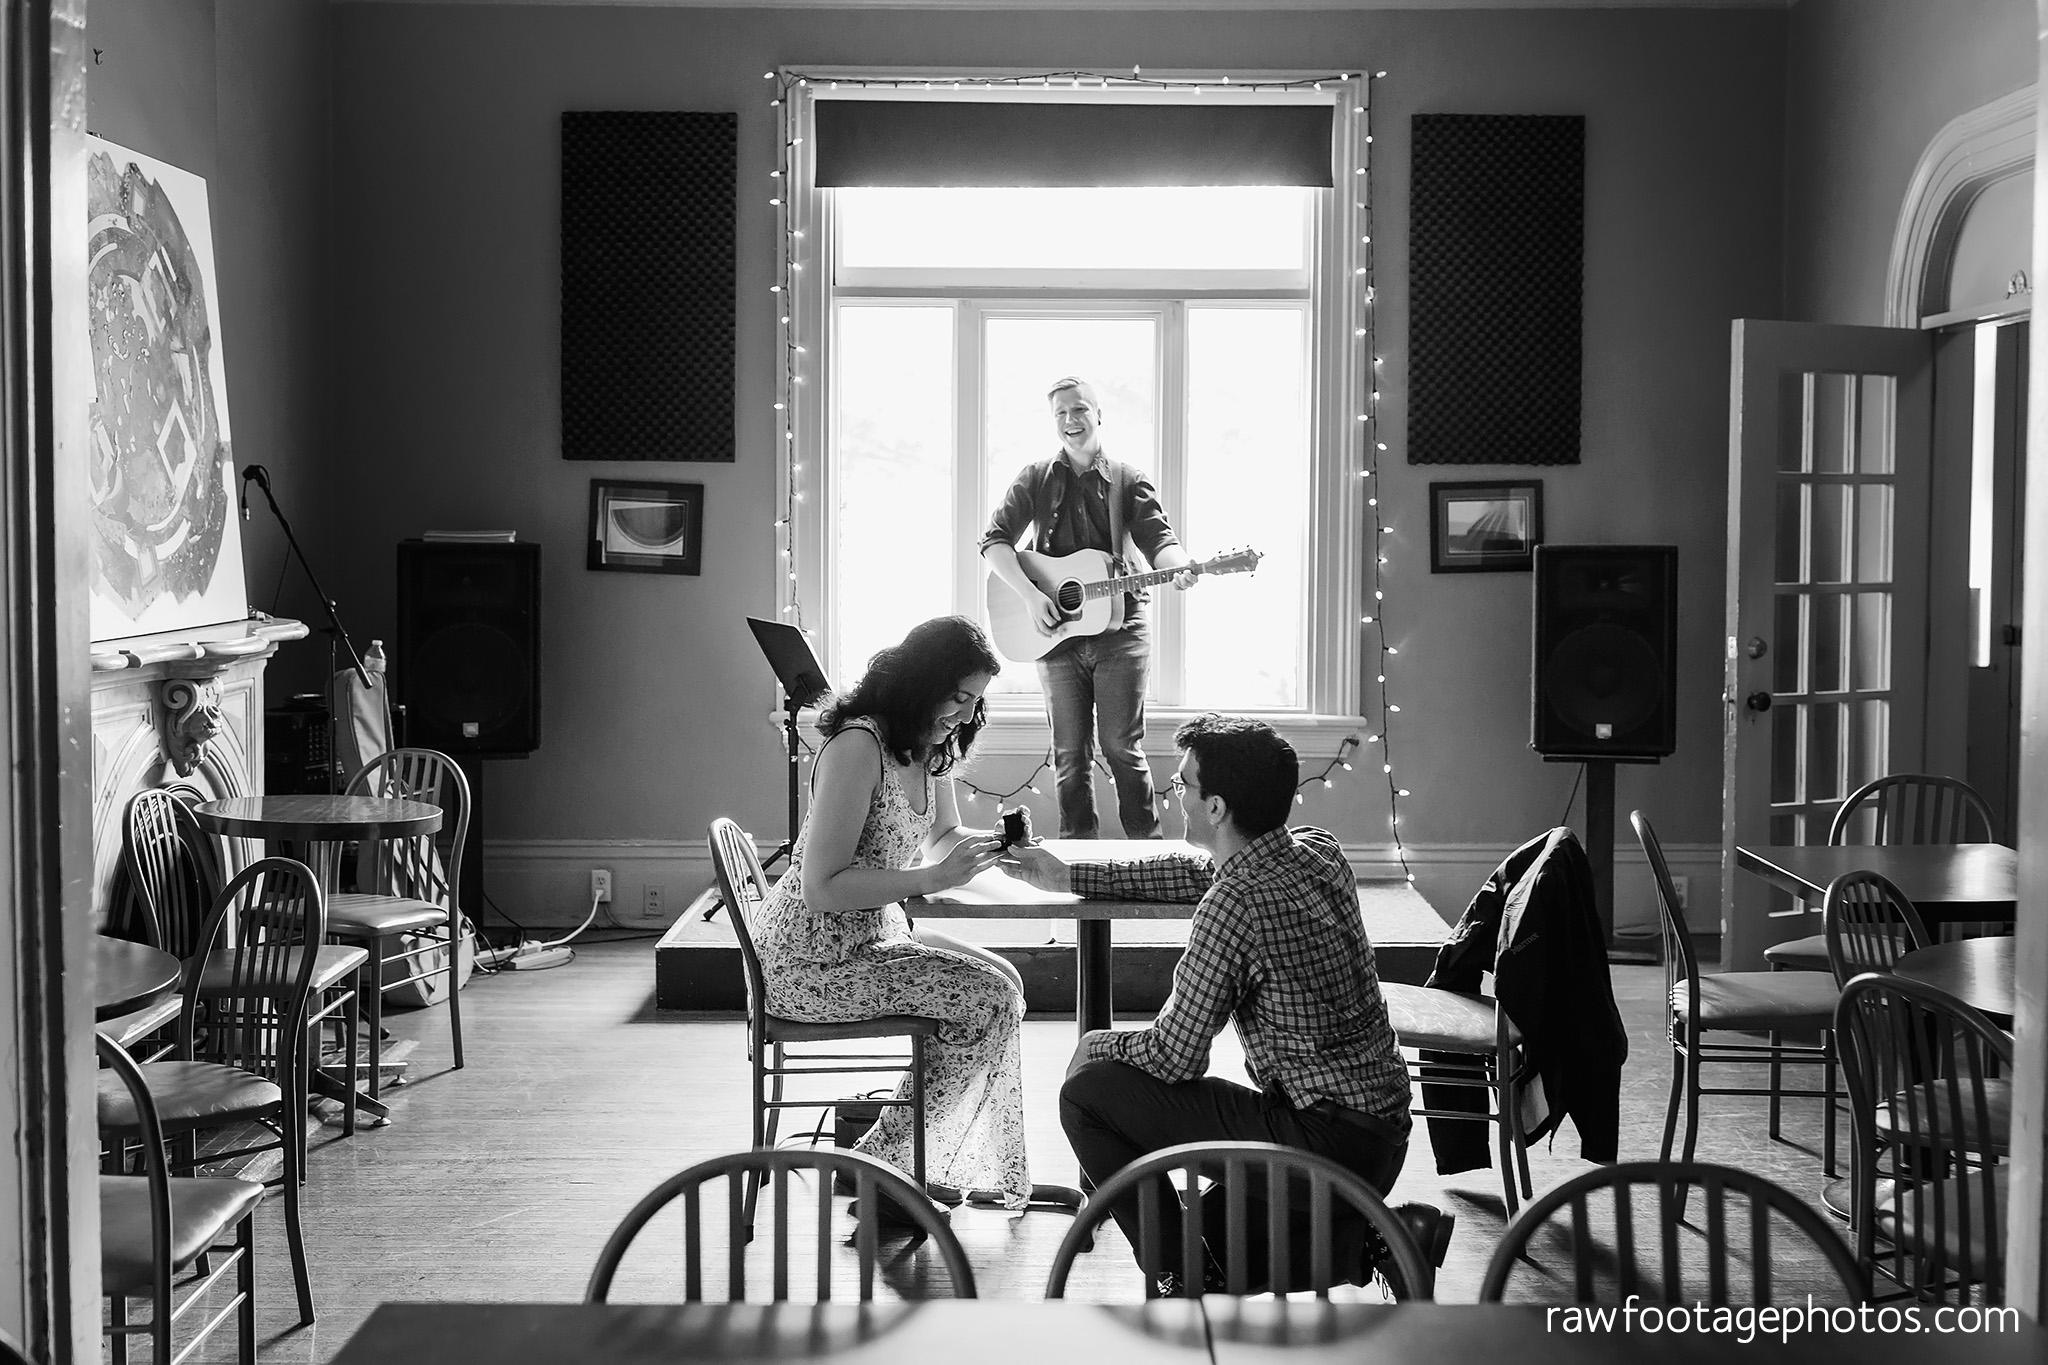 london_ontario_photographer-proposal_photographer-surprise_proposal-london_music_club-raw_footage_photography-wedding_photographer001.jpg